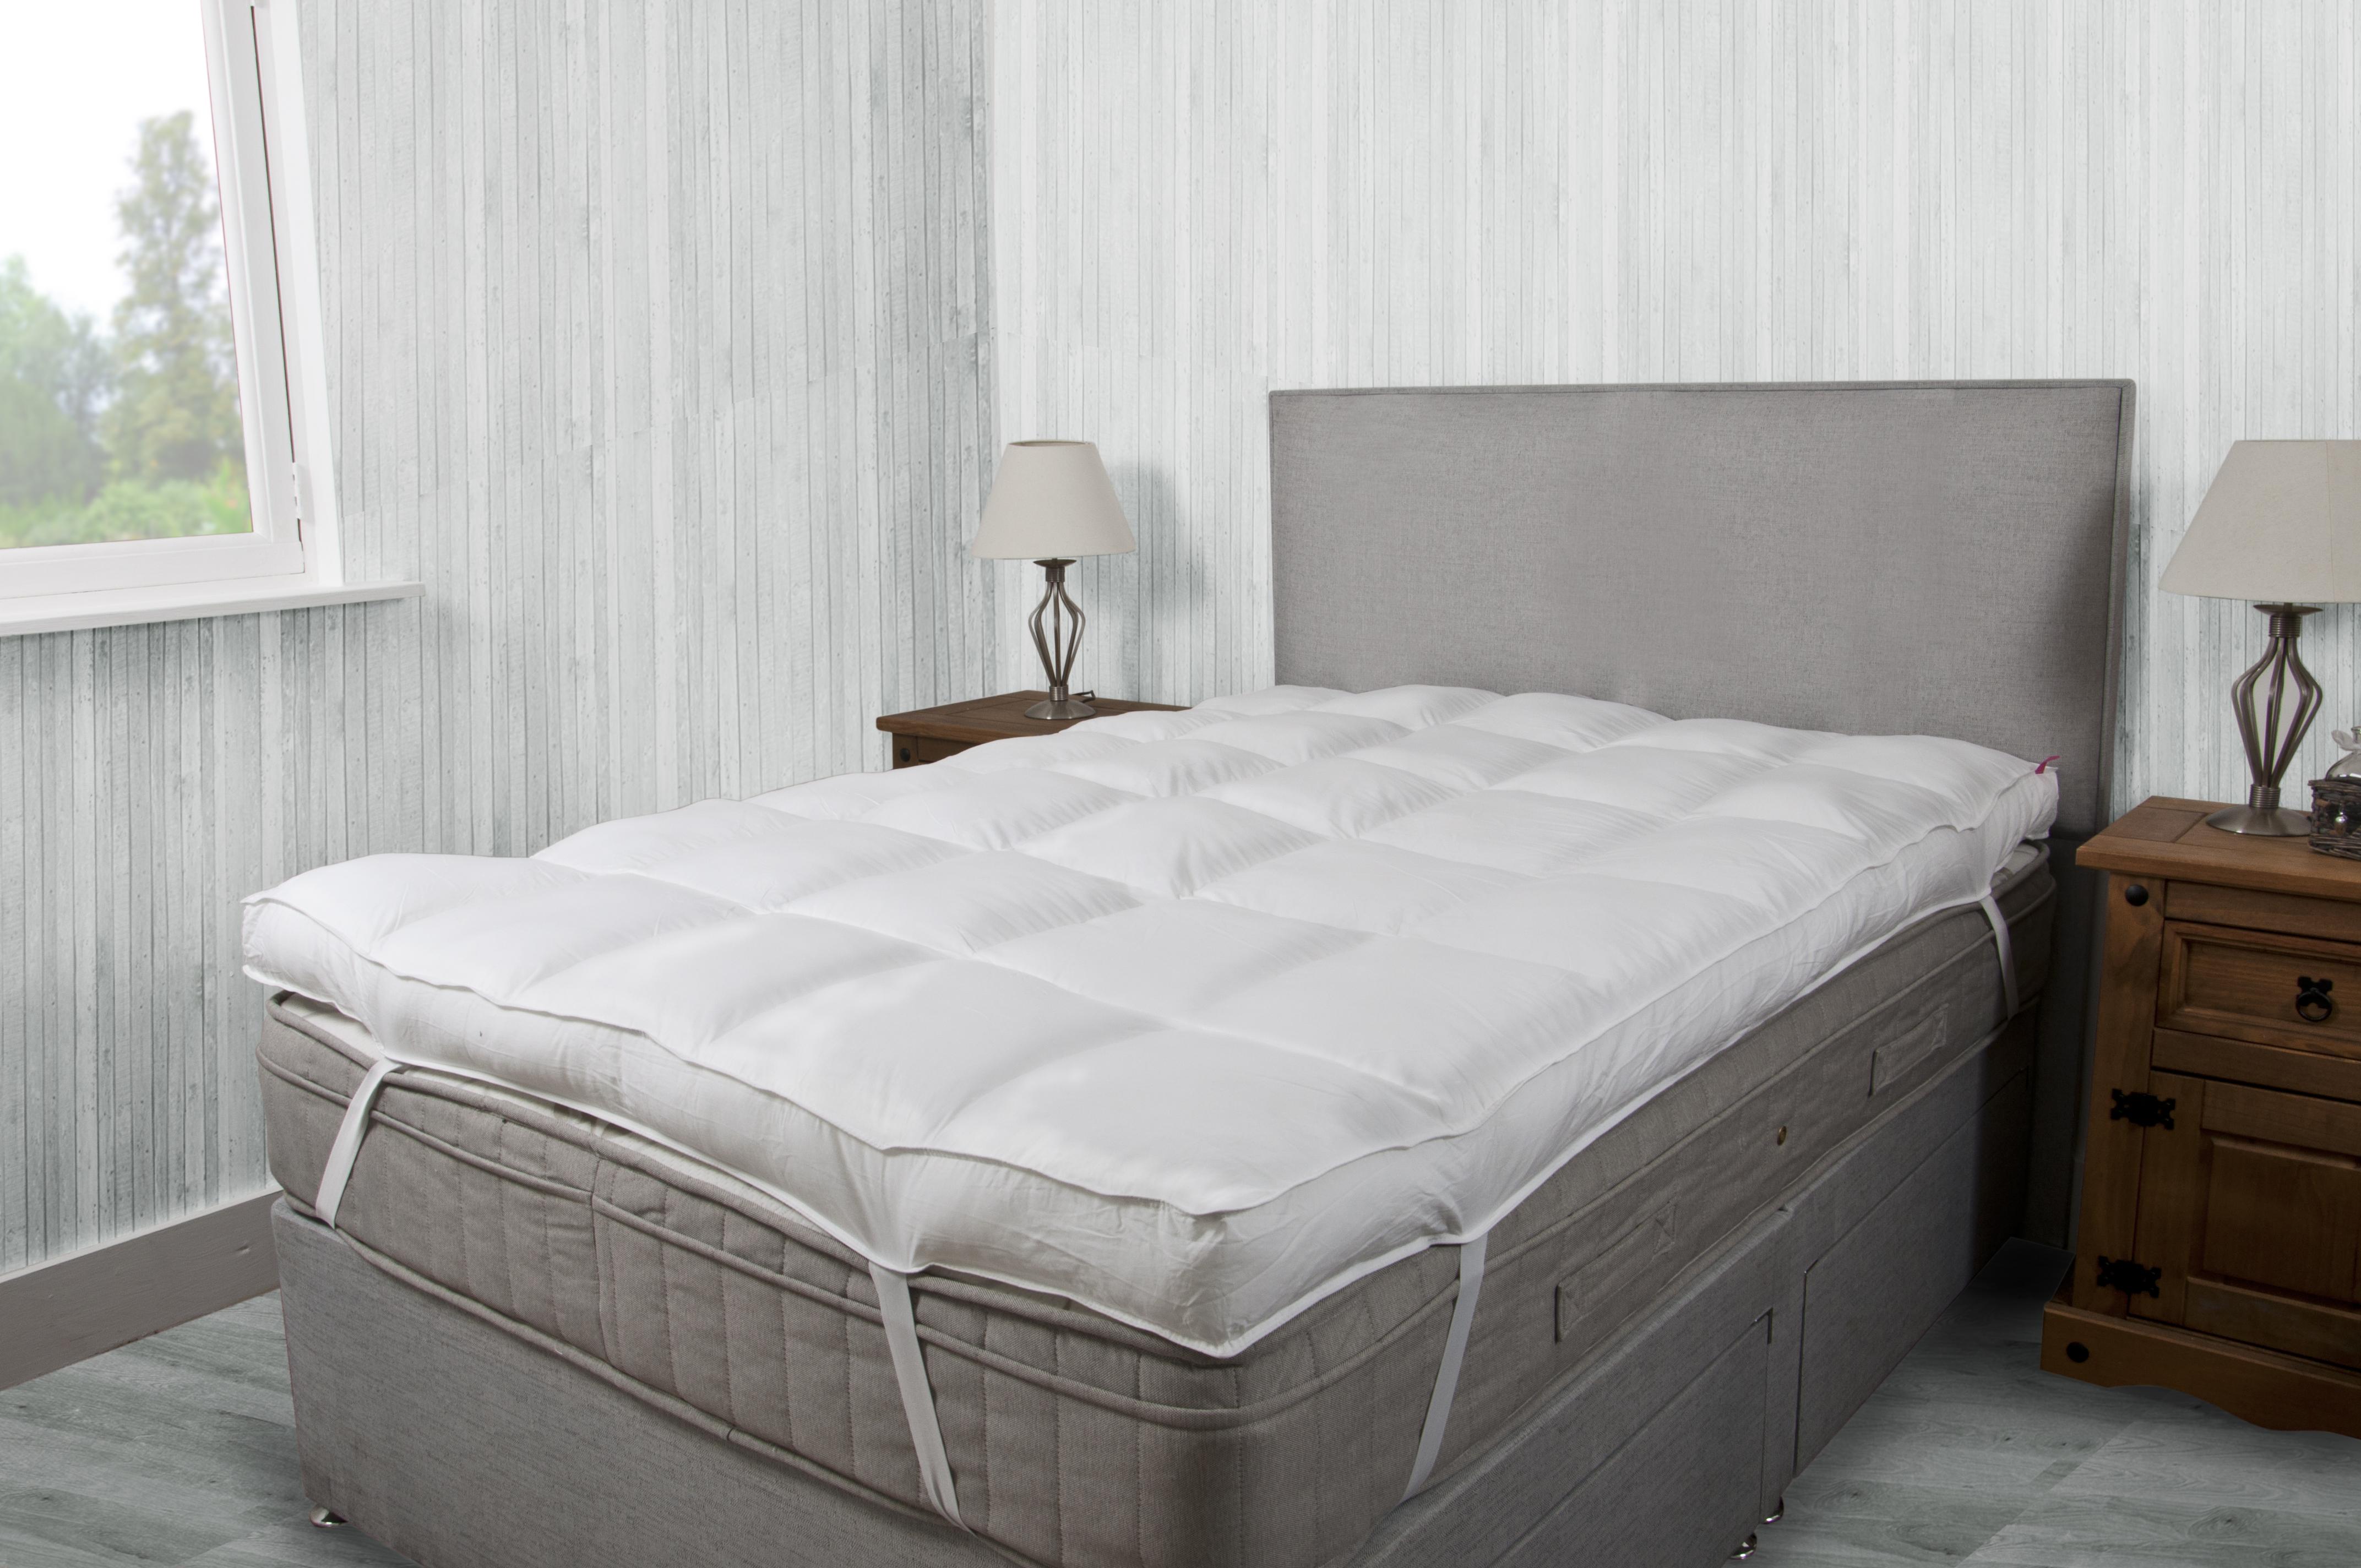 Hotel Quality 4 Inch 10cm Deep Mattress Topper 5 Star